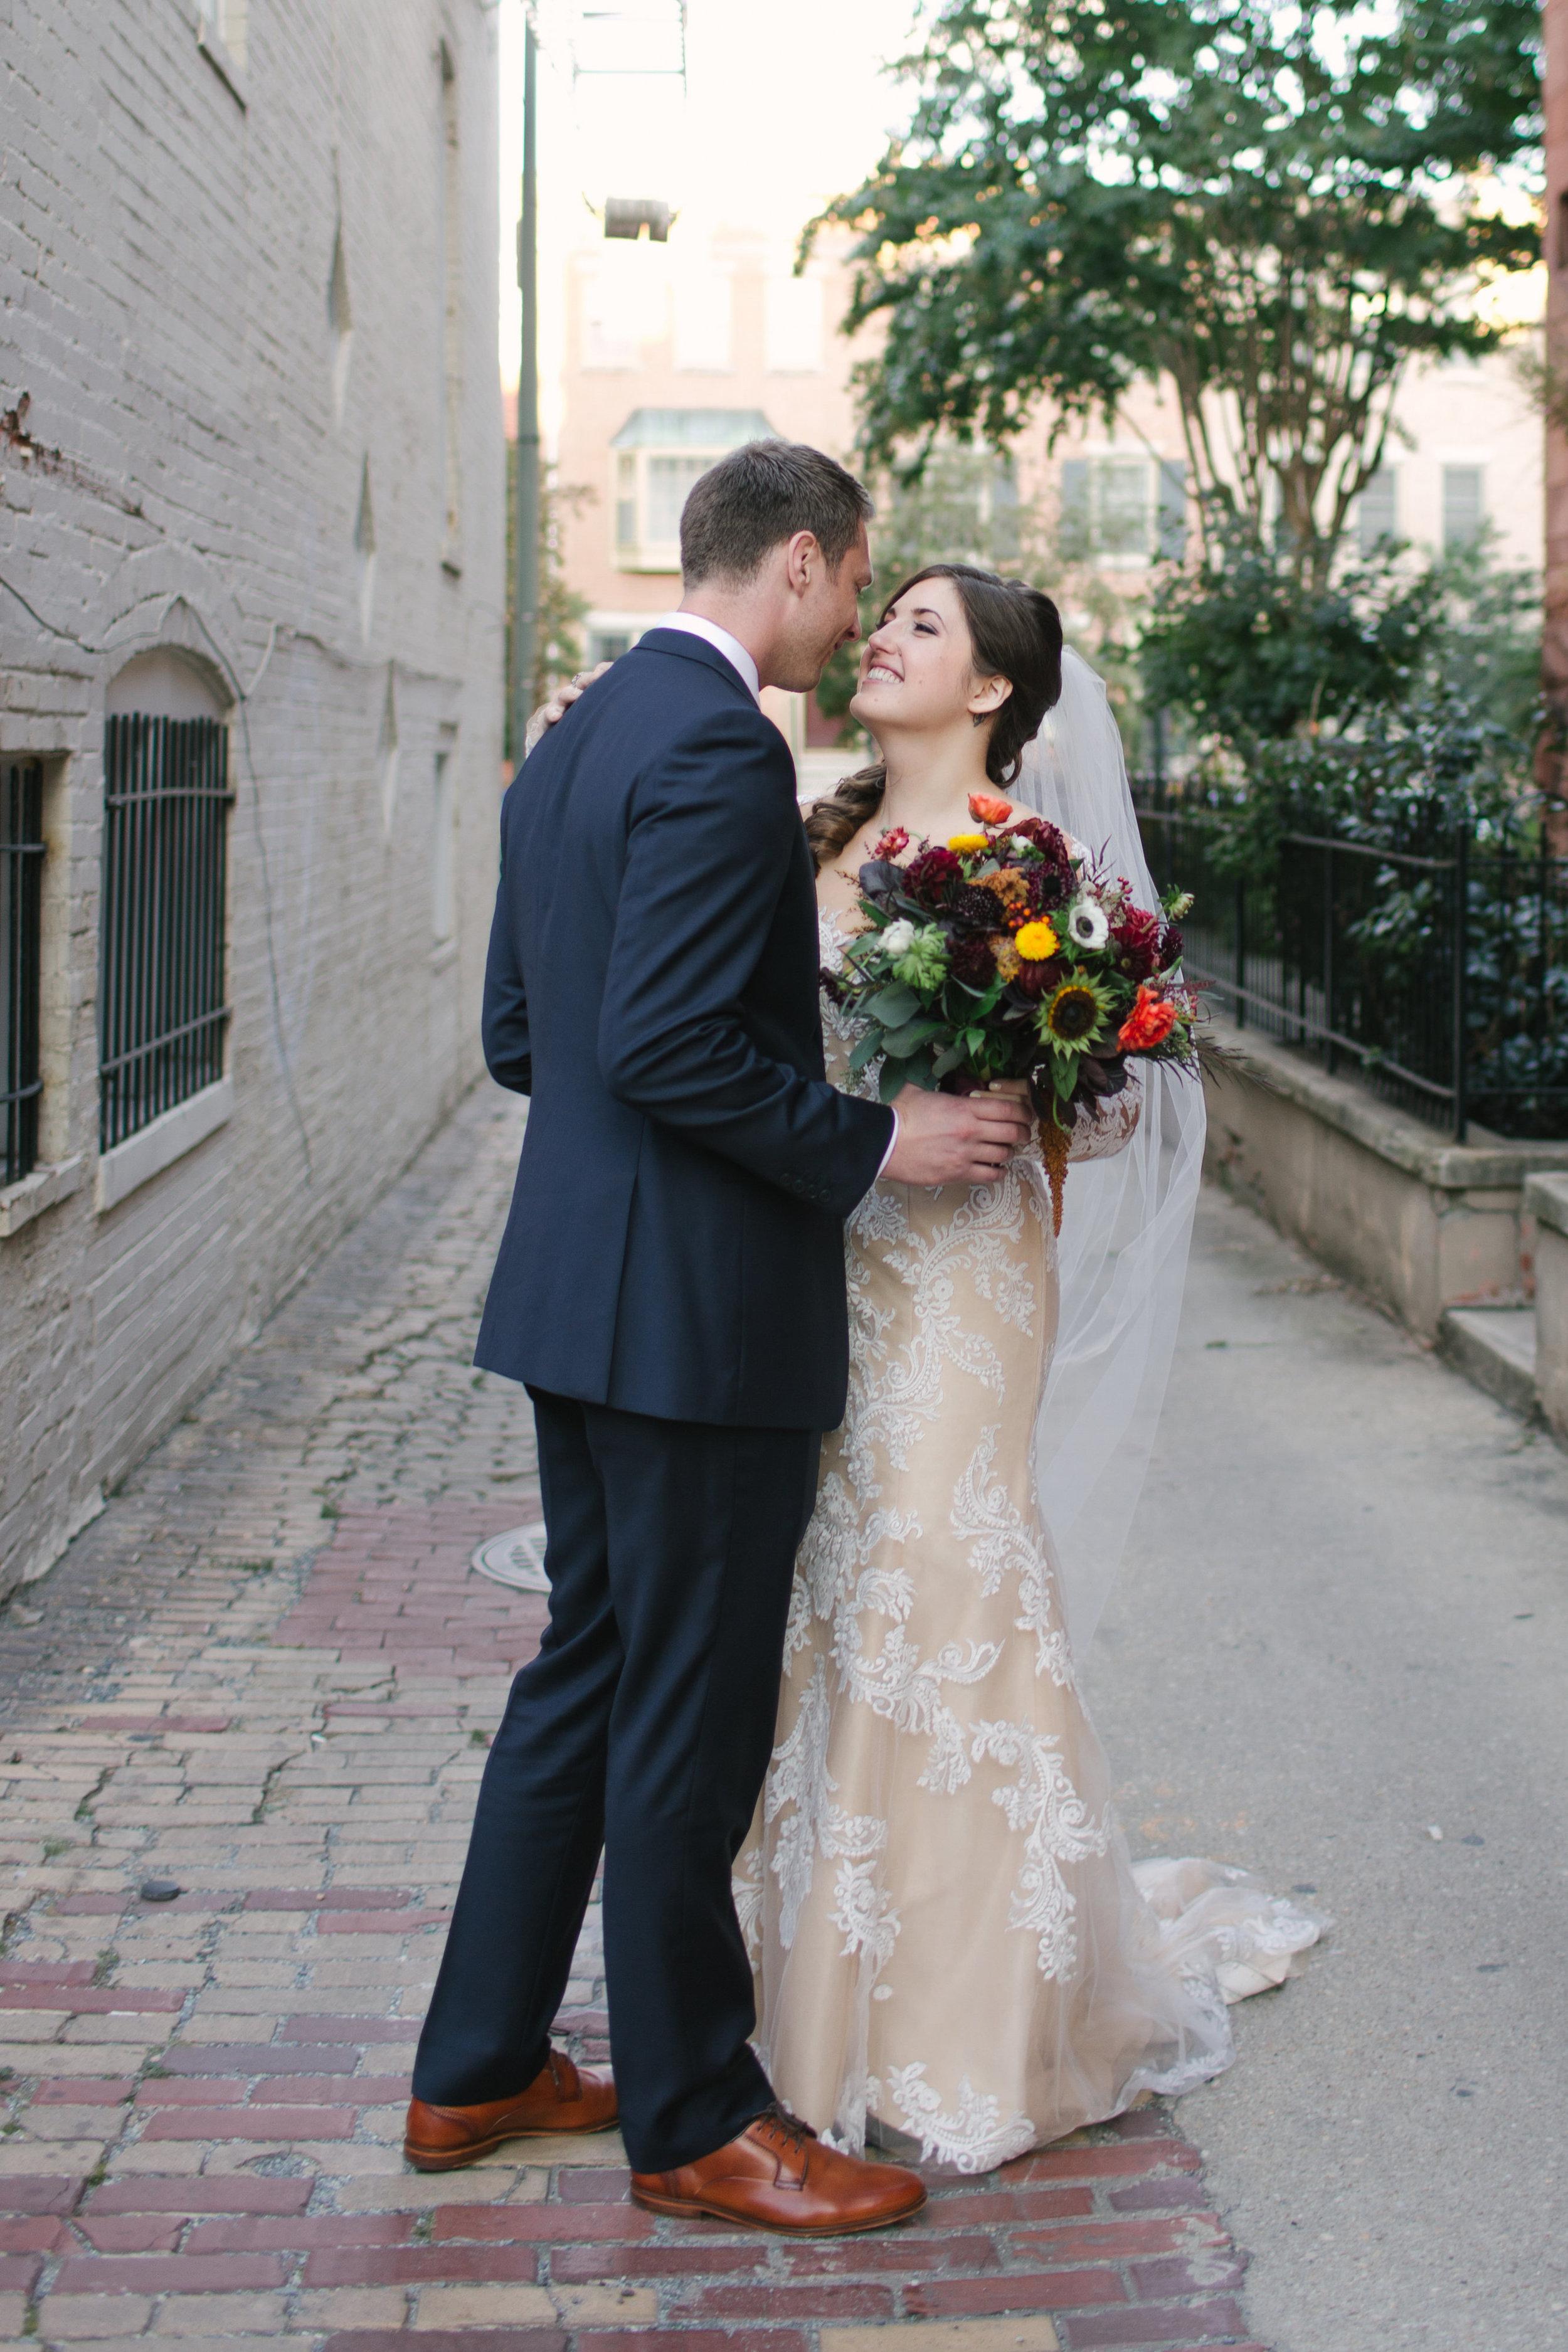 Dupon Circle Wedding | Washington DC Wedding Photography | Rebecca Wilcher Photography -15.jpg